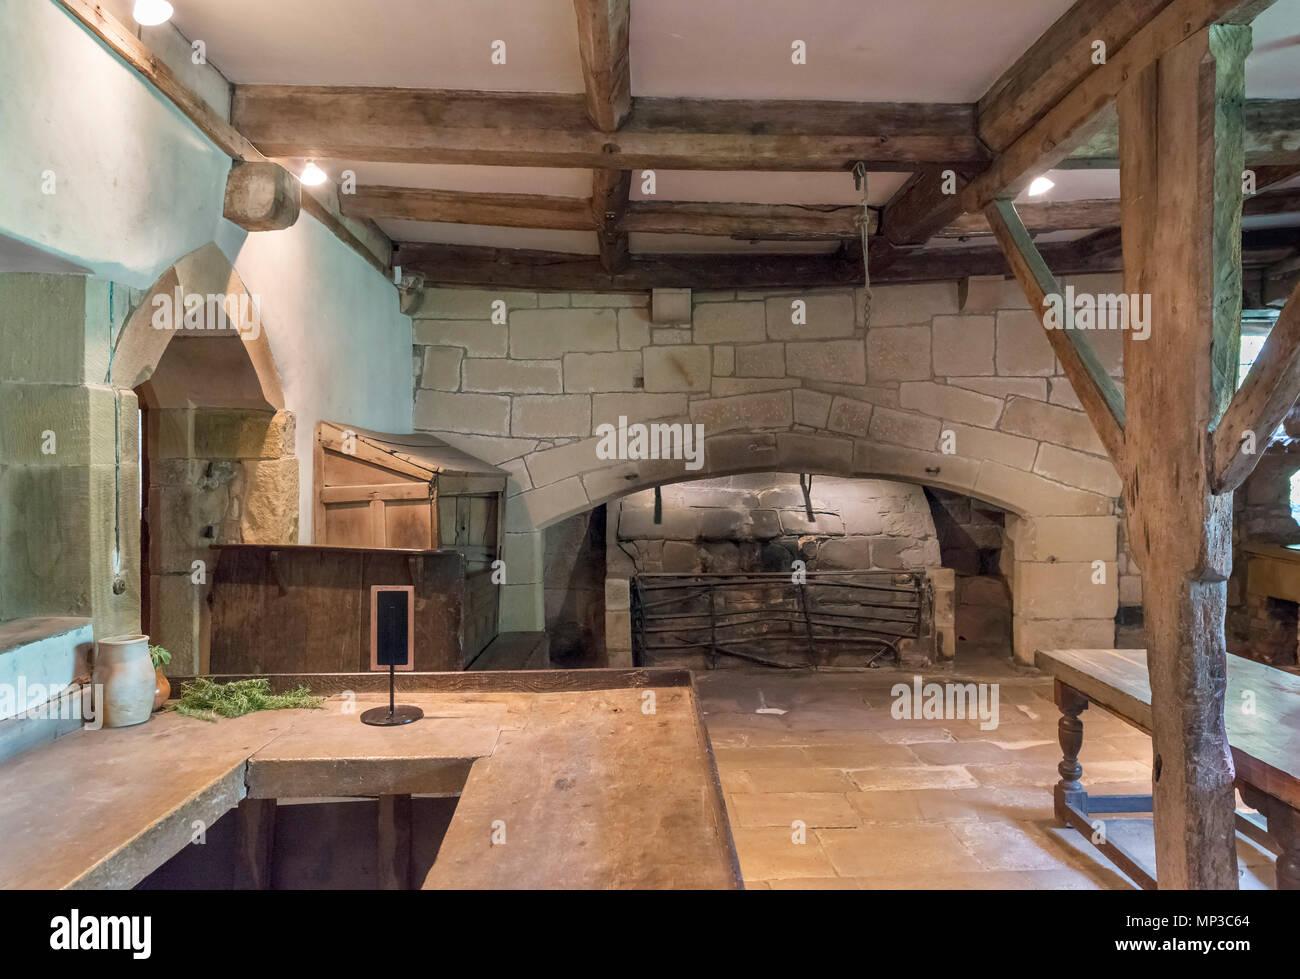 Tudor kitchen at Haddon Hall, near Bakewell, Derbyshire, England, UK - Stock Image